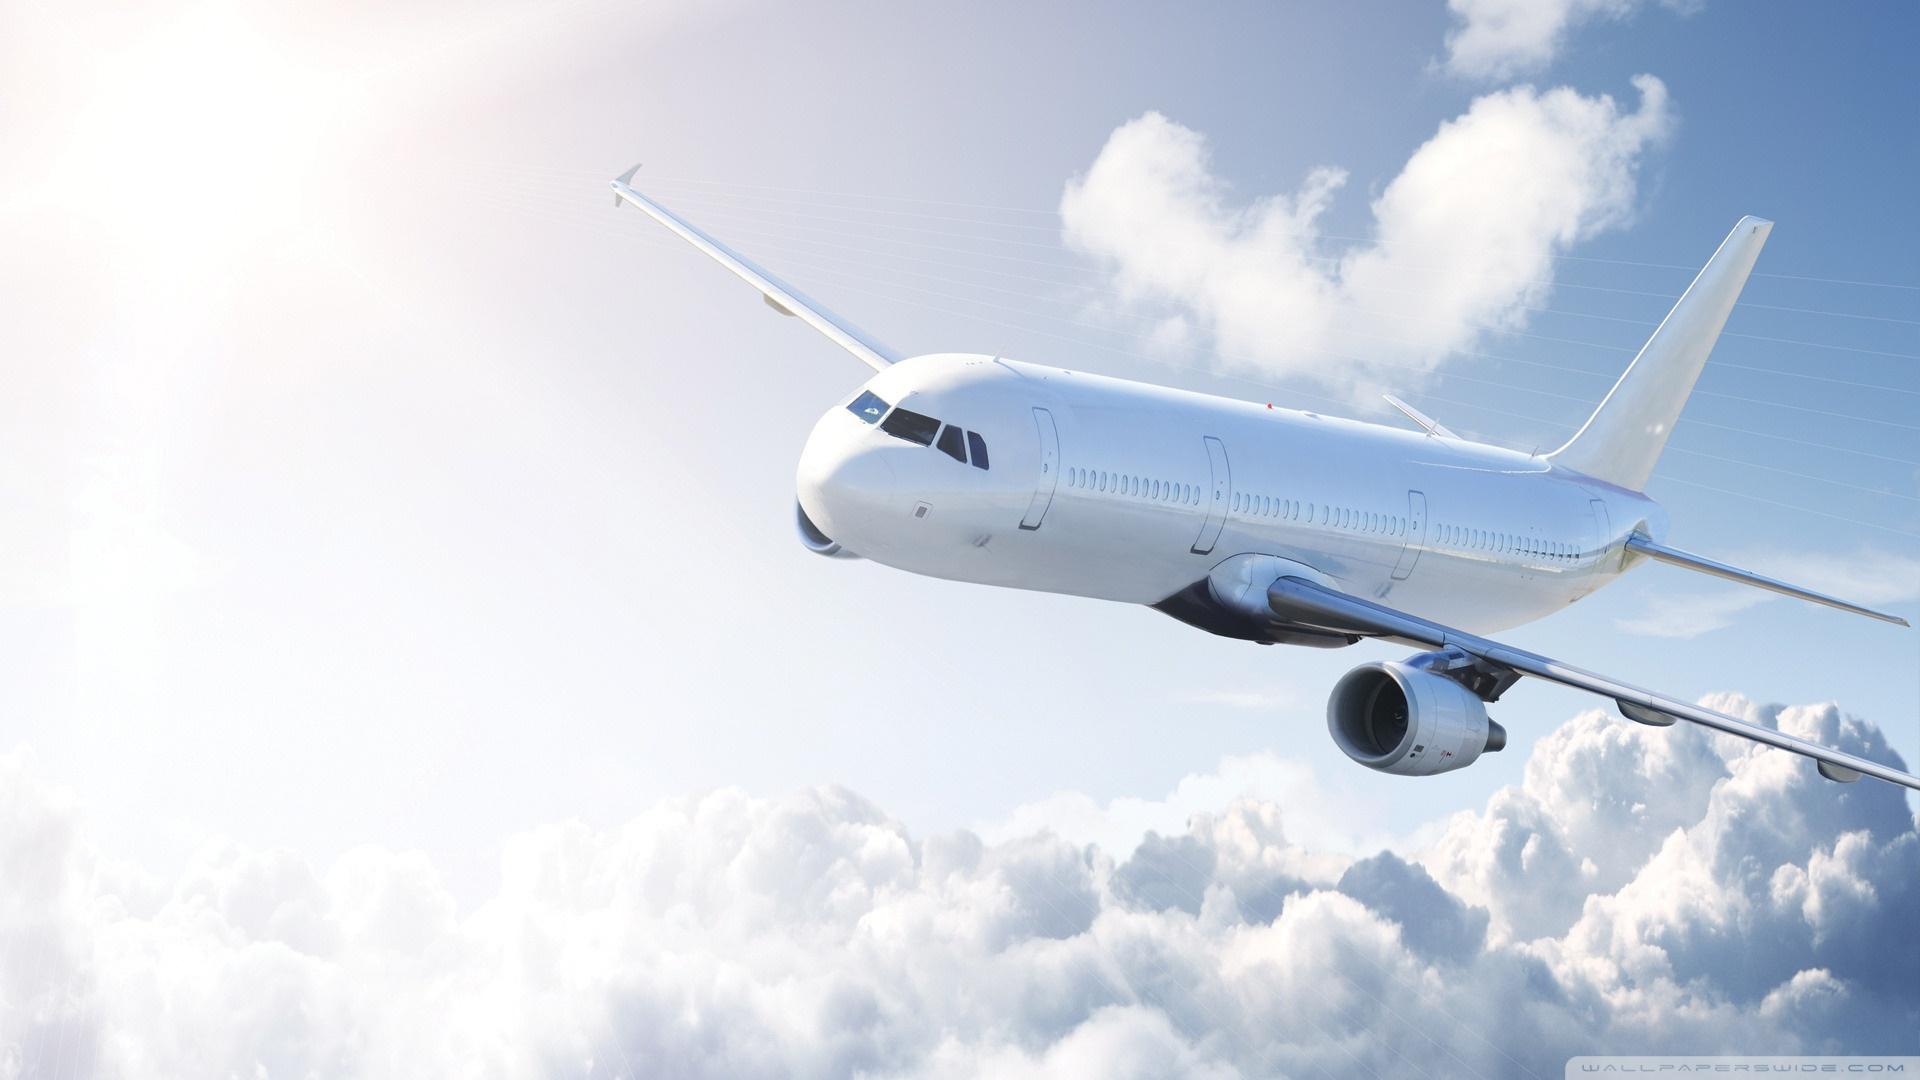 white airplane ❤ 4k hd desktop wallpaper for 4k ultra hd tv